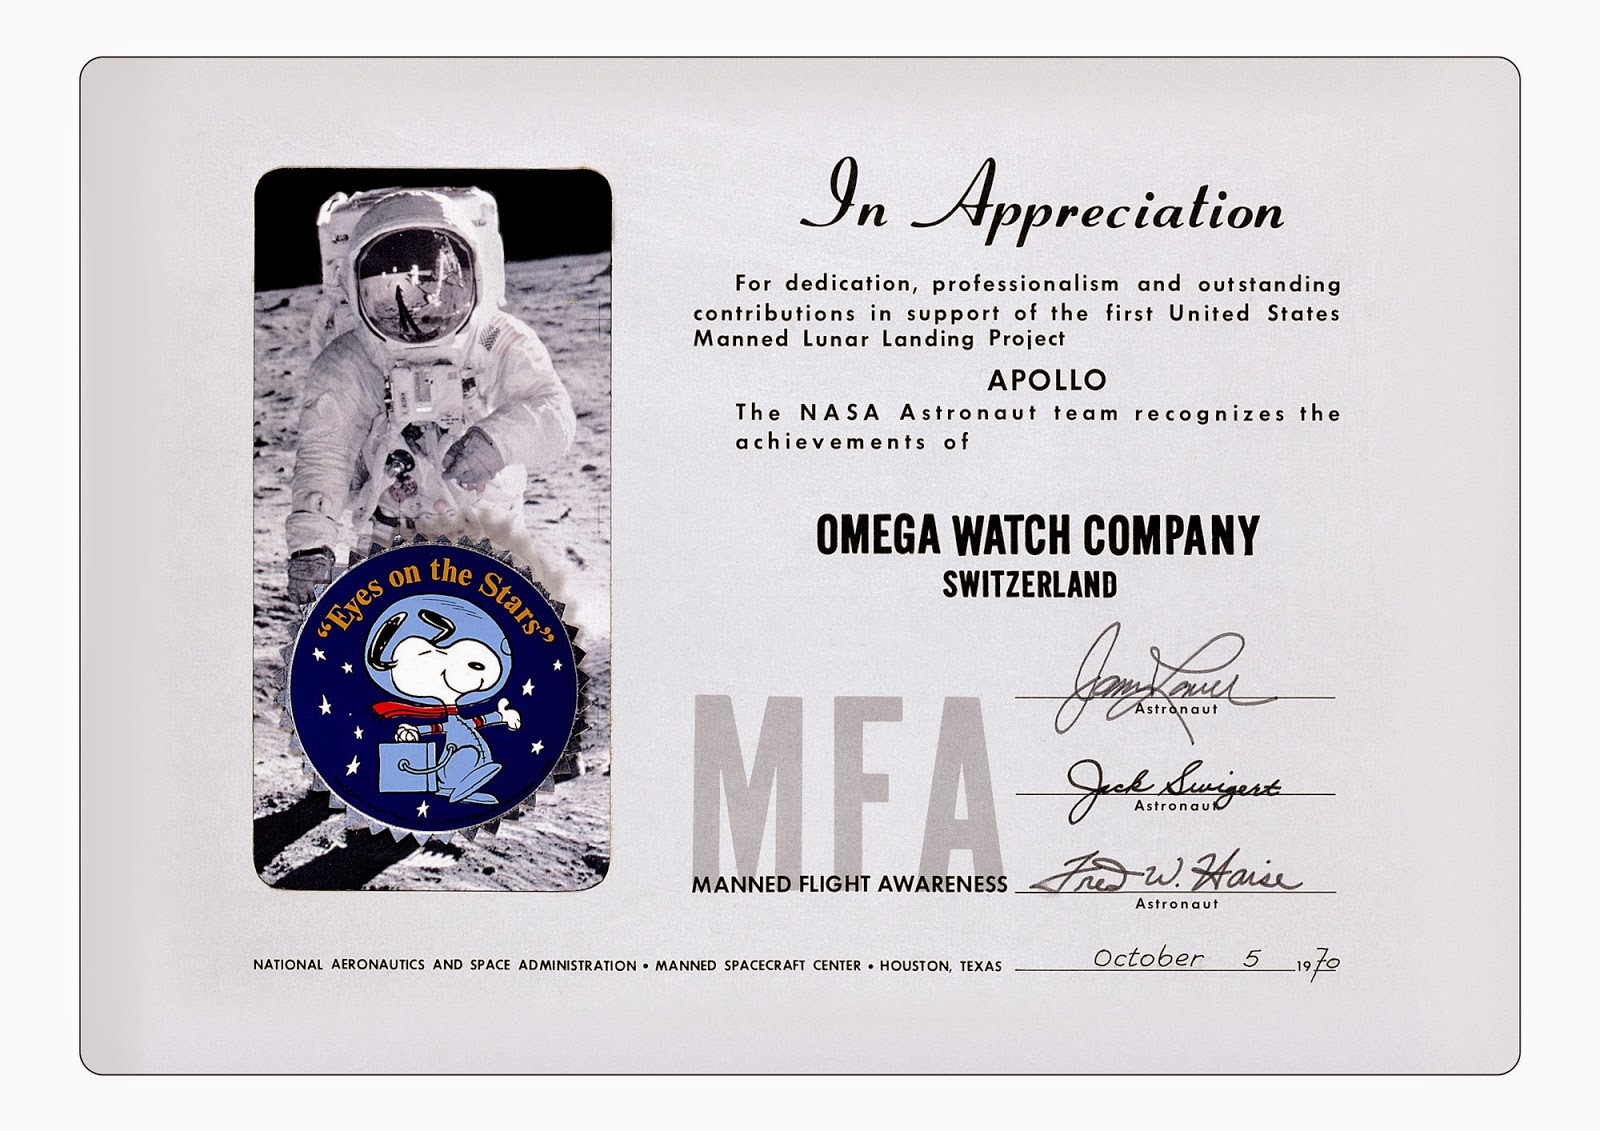 OMEGA Speedmaster Professional Snoopy Edition